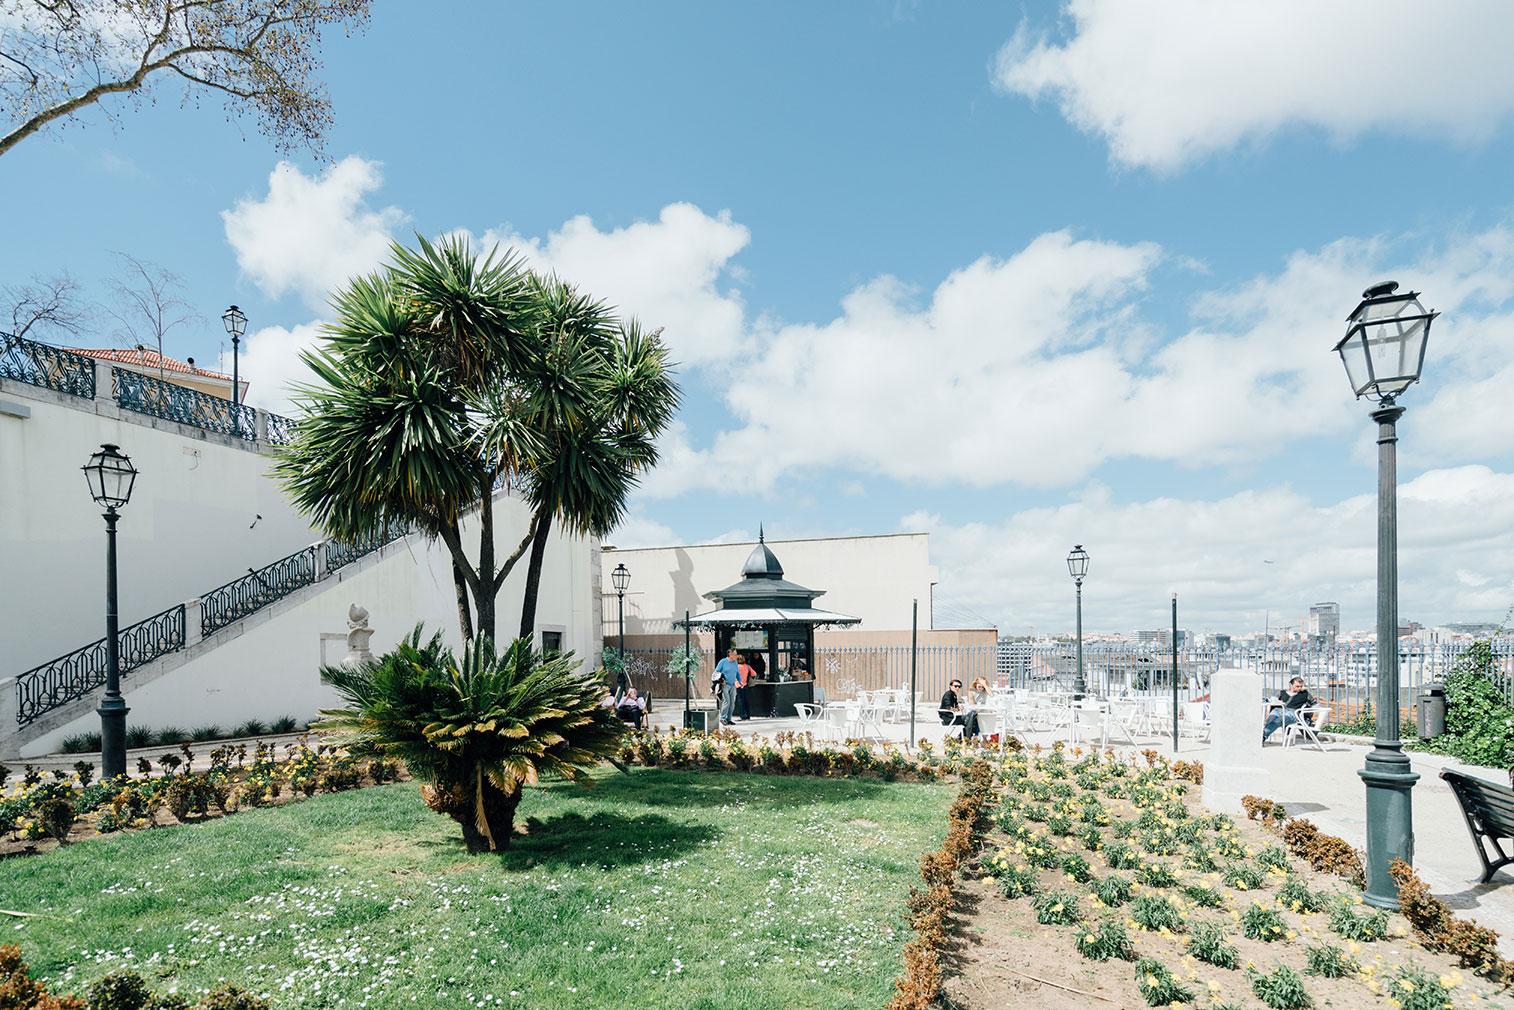 Lisbon-kiosks-richard-john-seymour-4